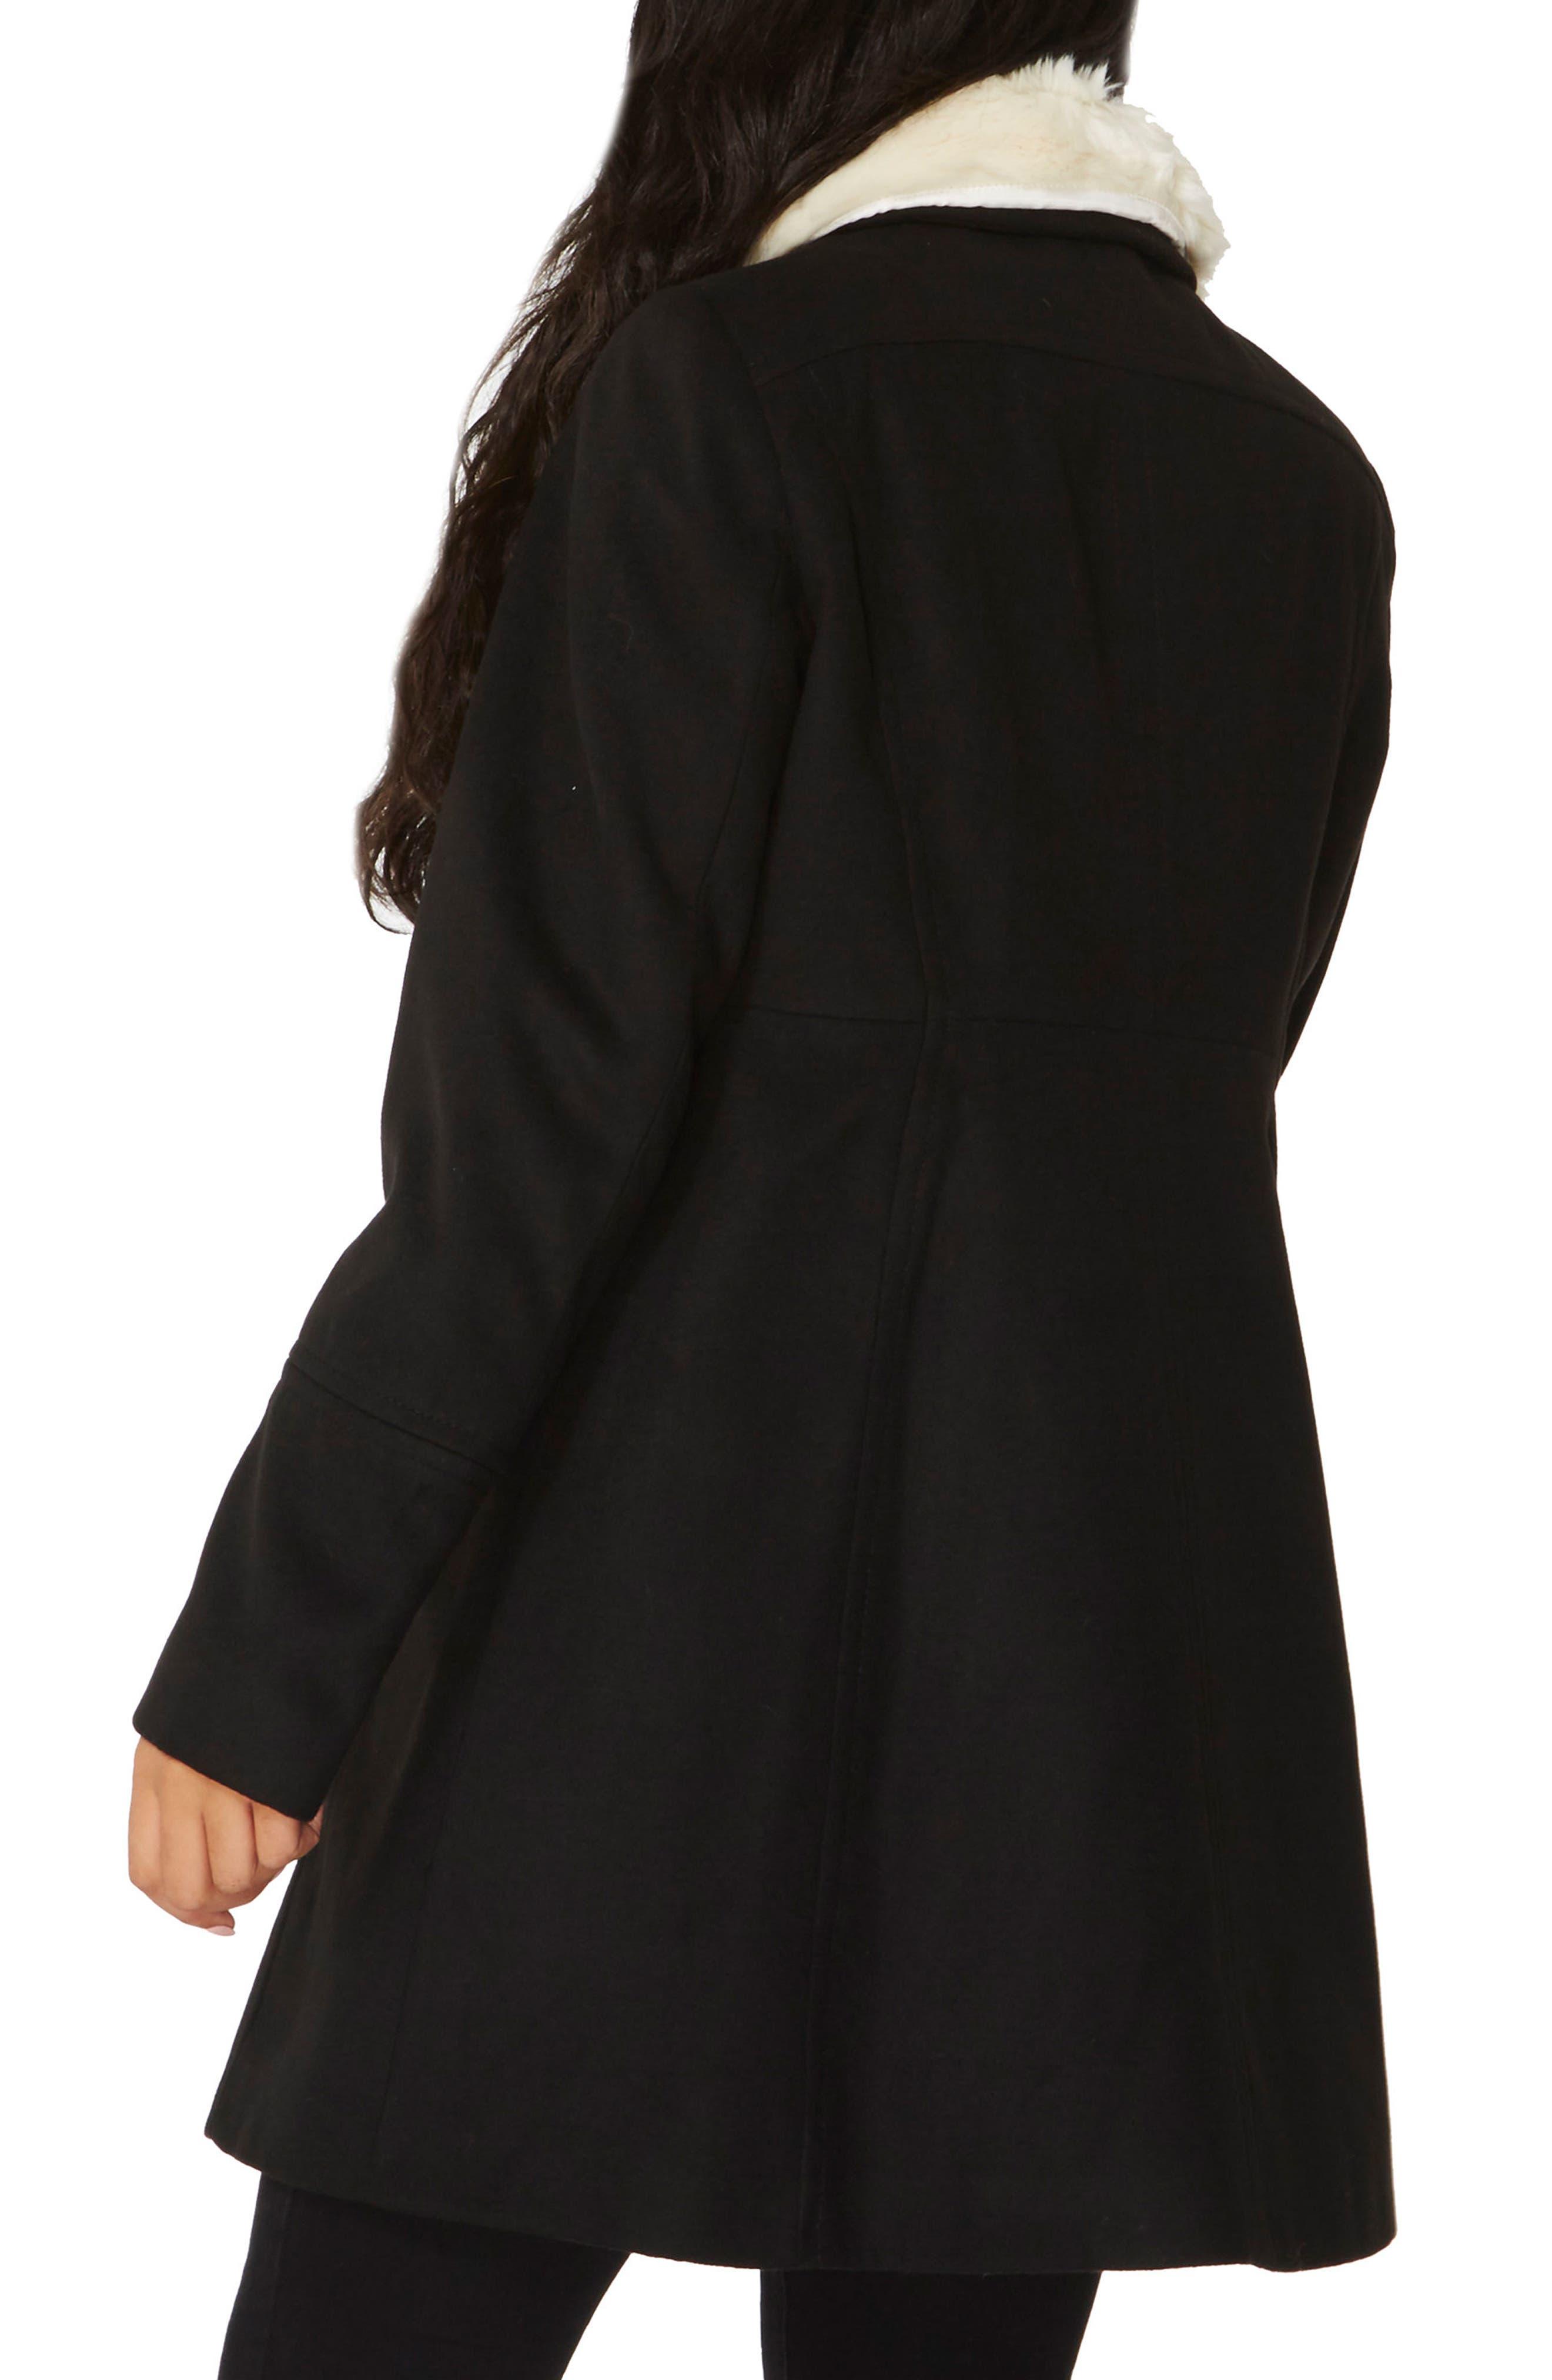 Fit & Flare Peacoat with Removable Faux Fur Trim,                             Alternate thumbnail 3, color,                             Black